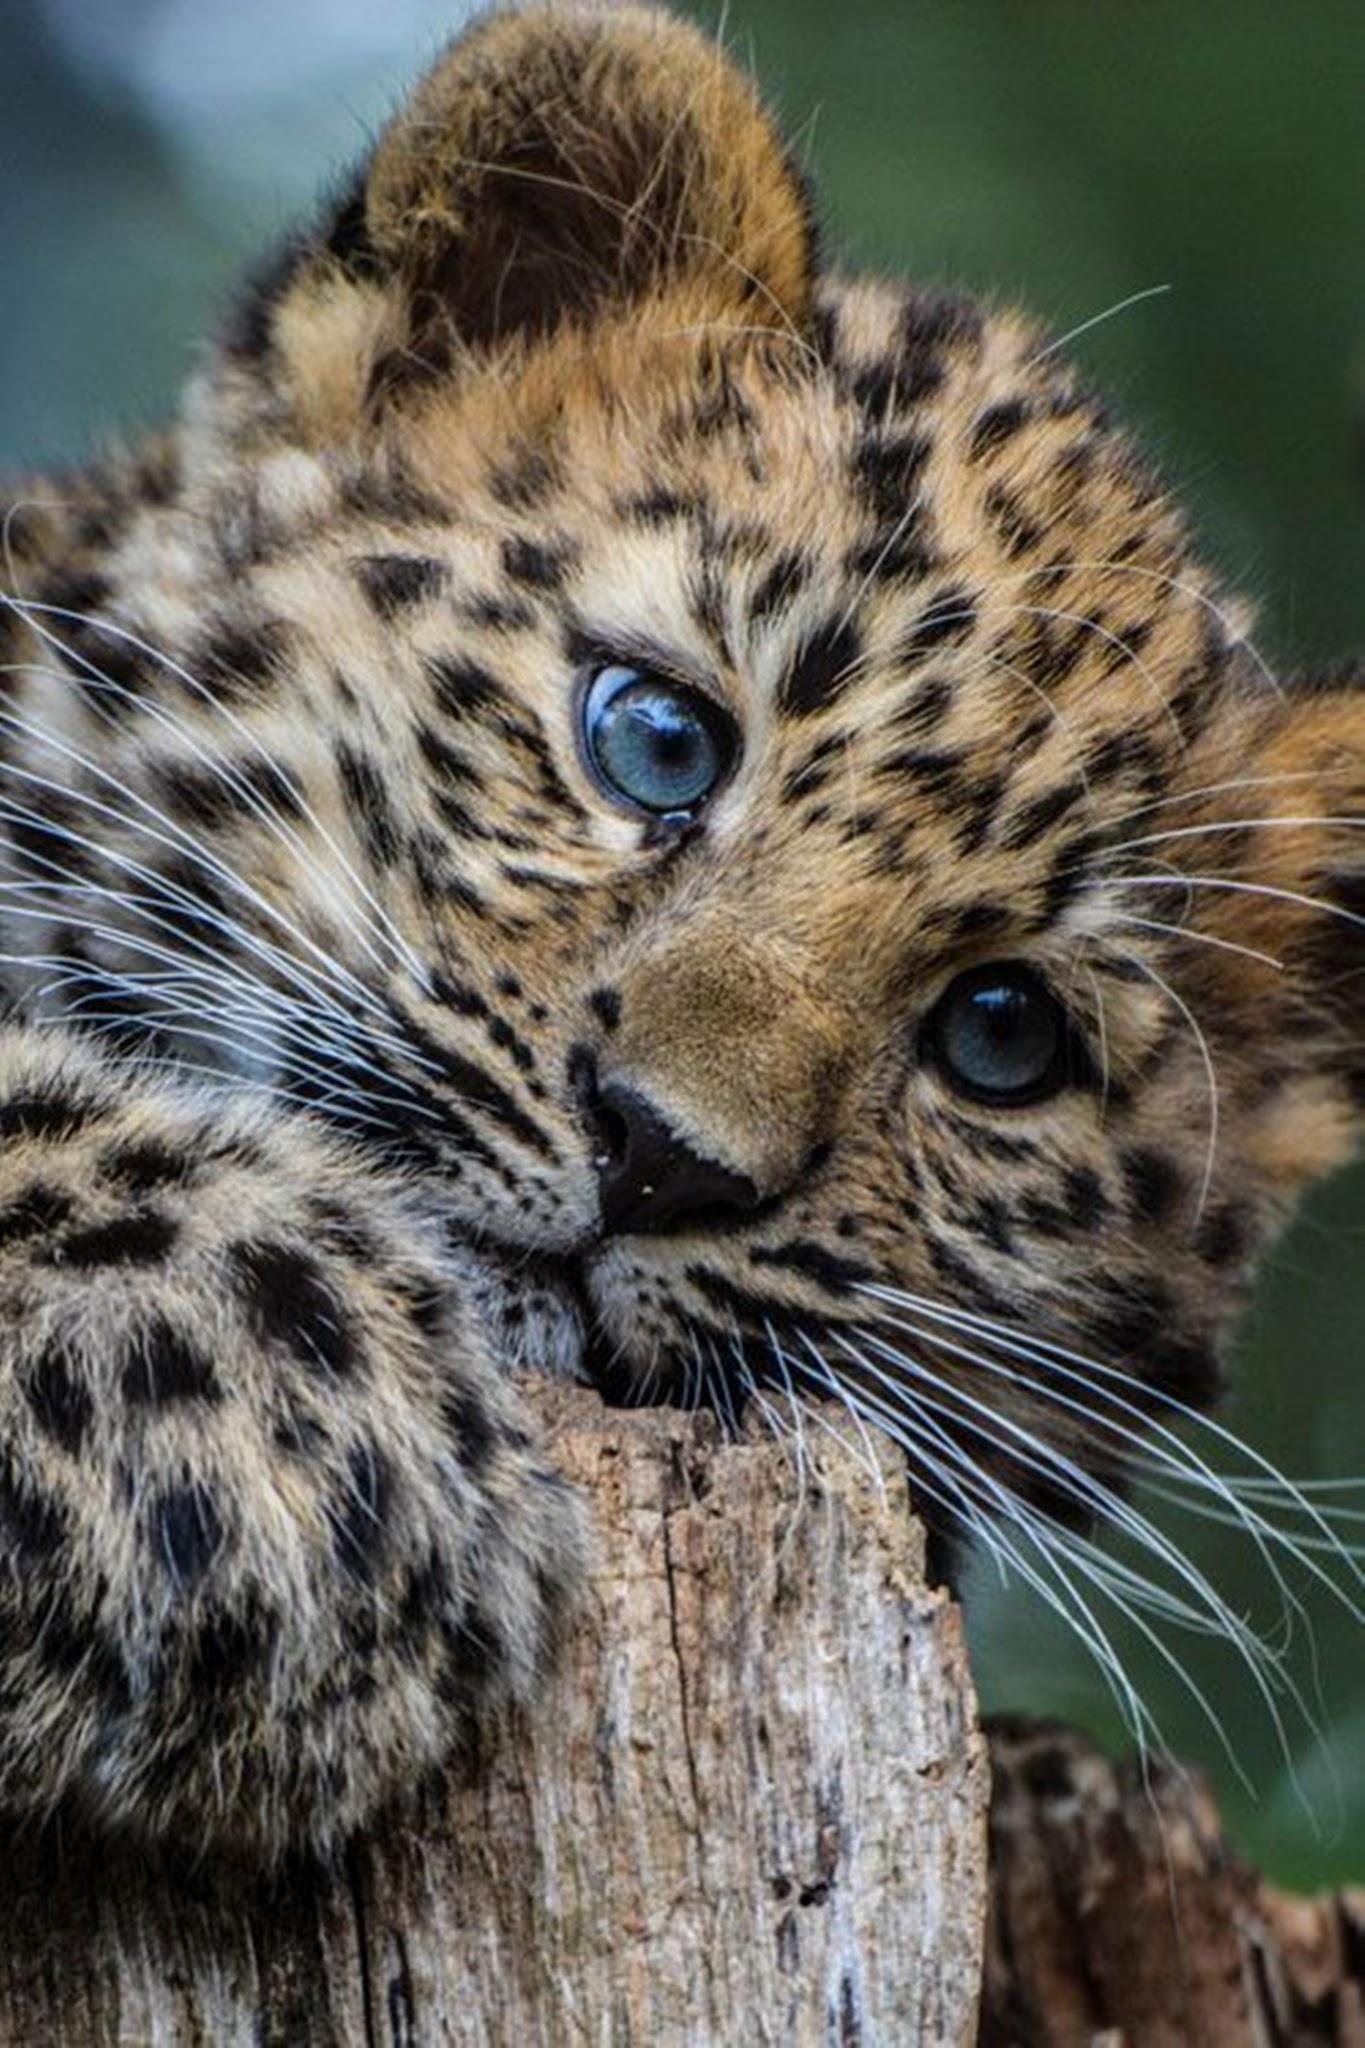 leopard cat mammal wildlife animal predator carnivore wild fur zoo safari hunter